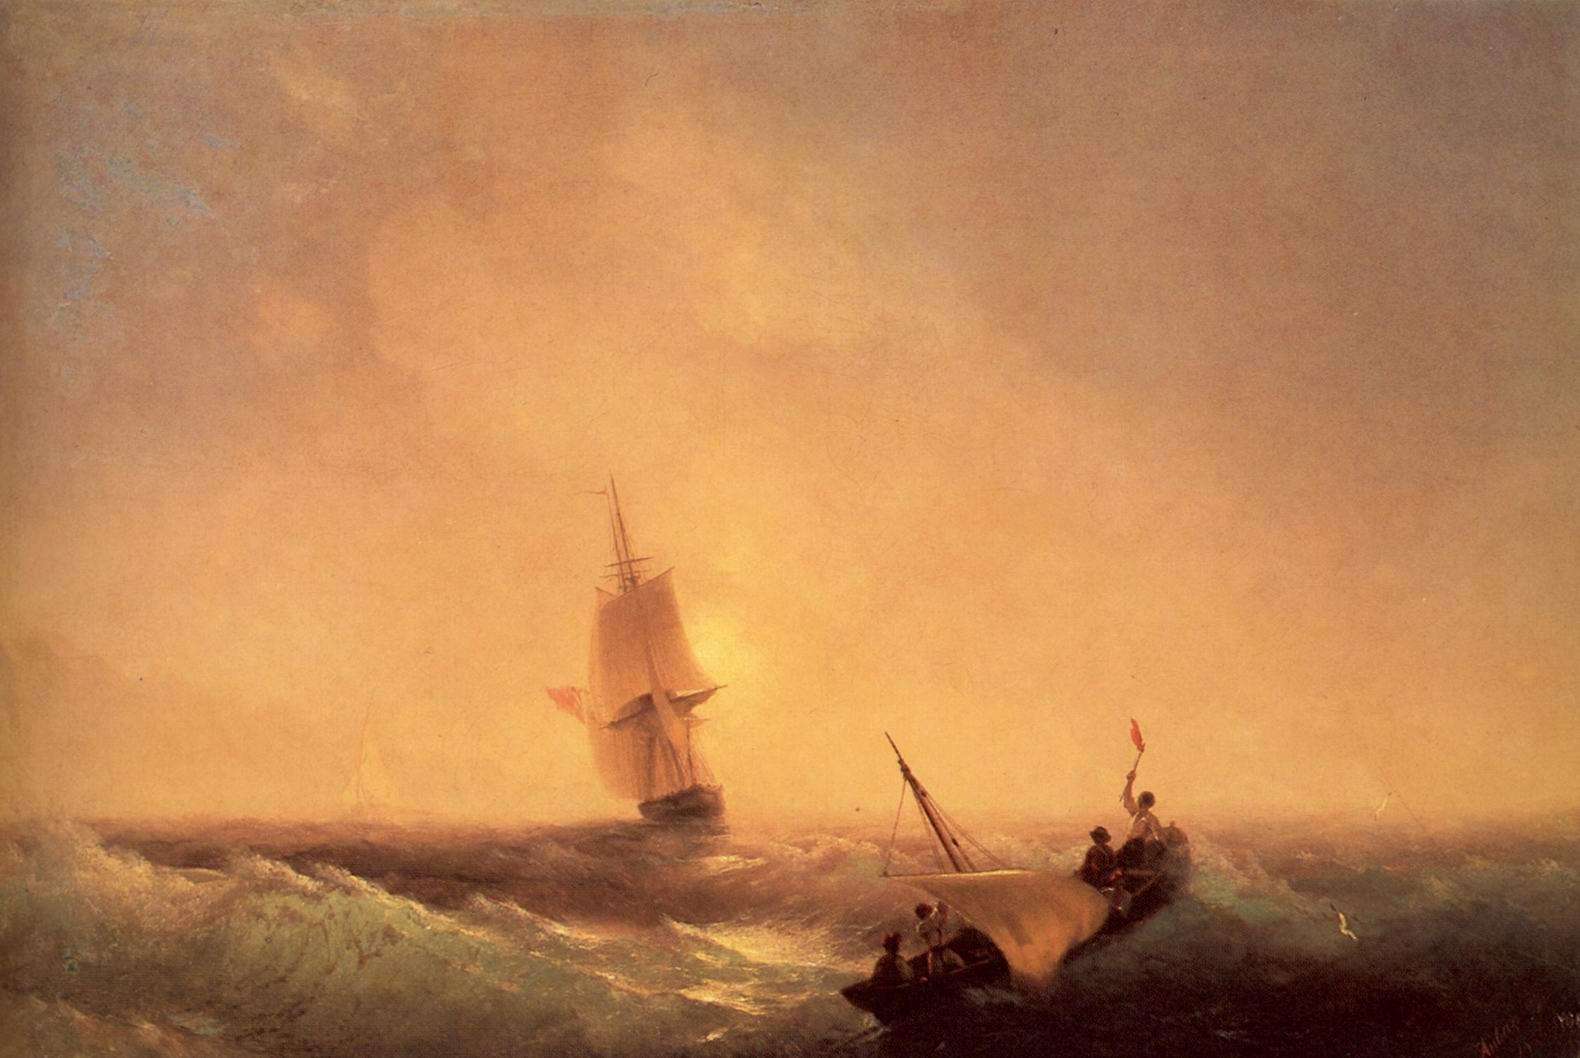 Спасающиеся от кораблекрушения, Айвазовский Иван Константинович